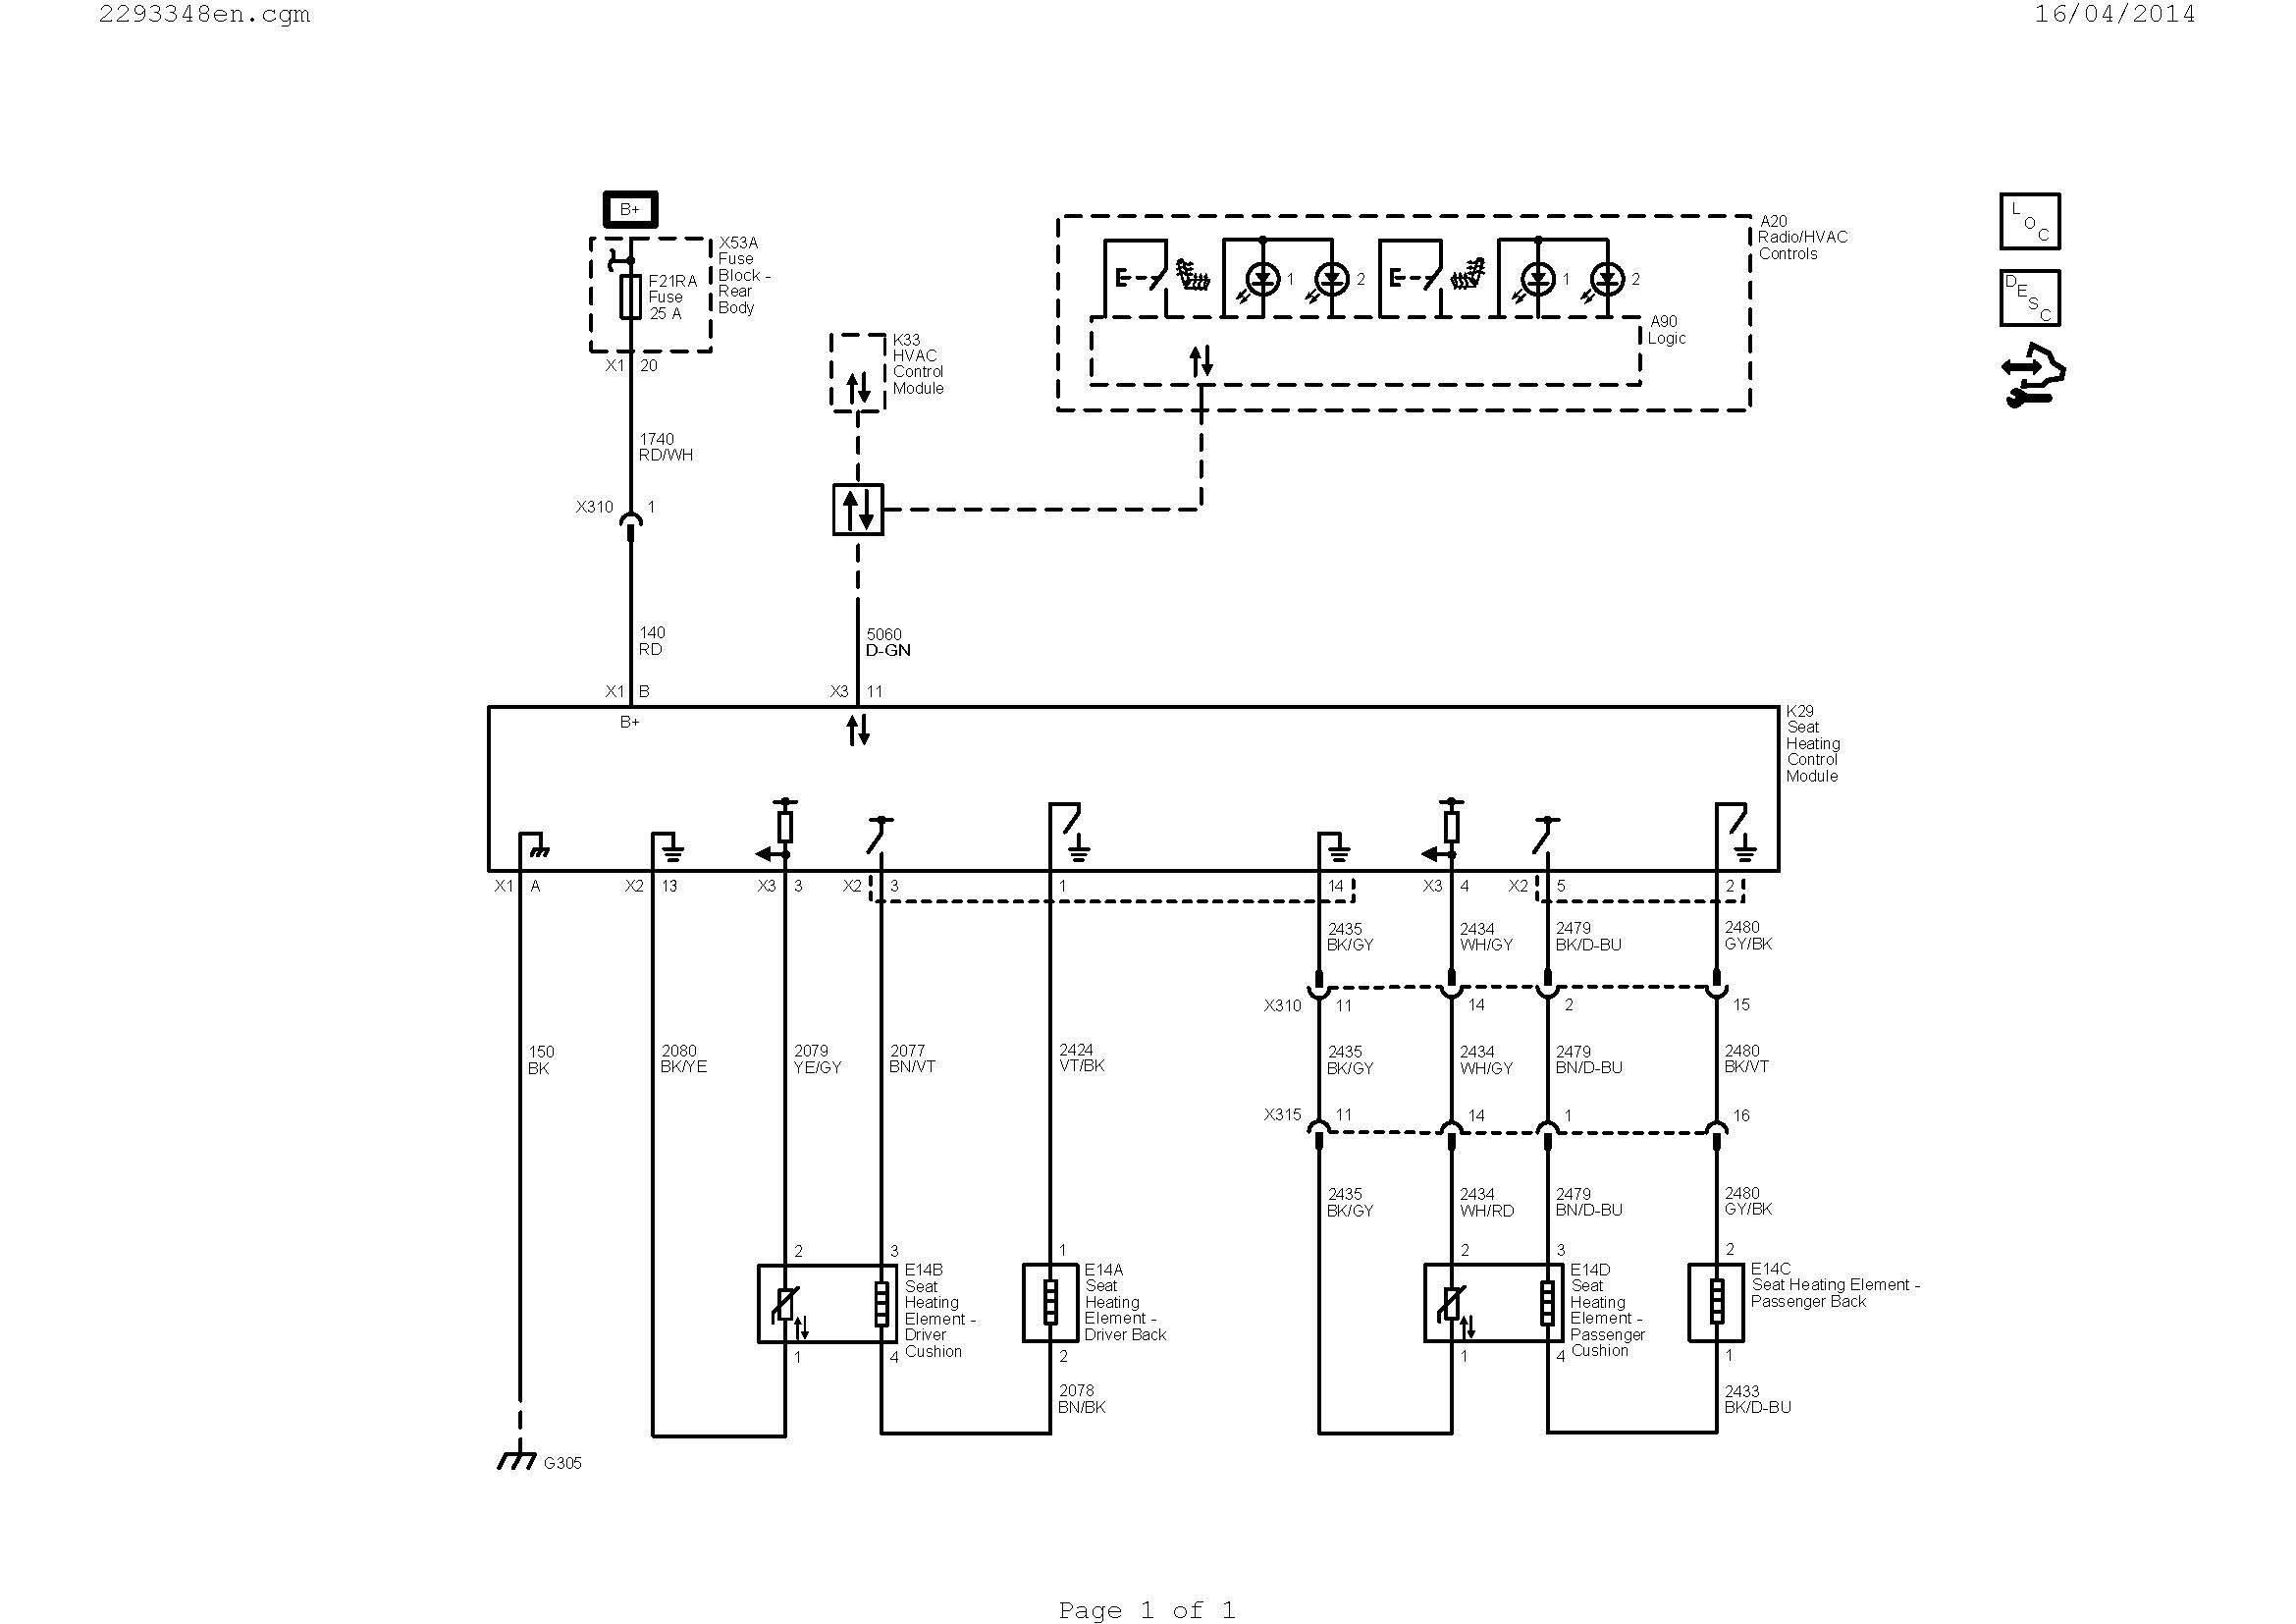 Furnace Blower Fan Relay Wiring | Wiring Diagram - Furnace Blower Motor Wiring Diagram